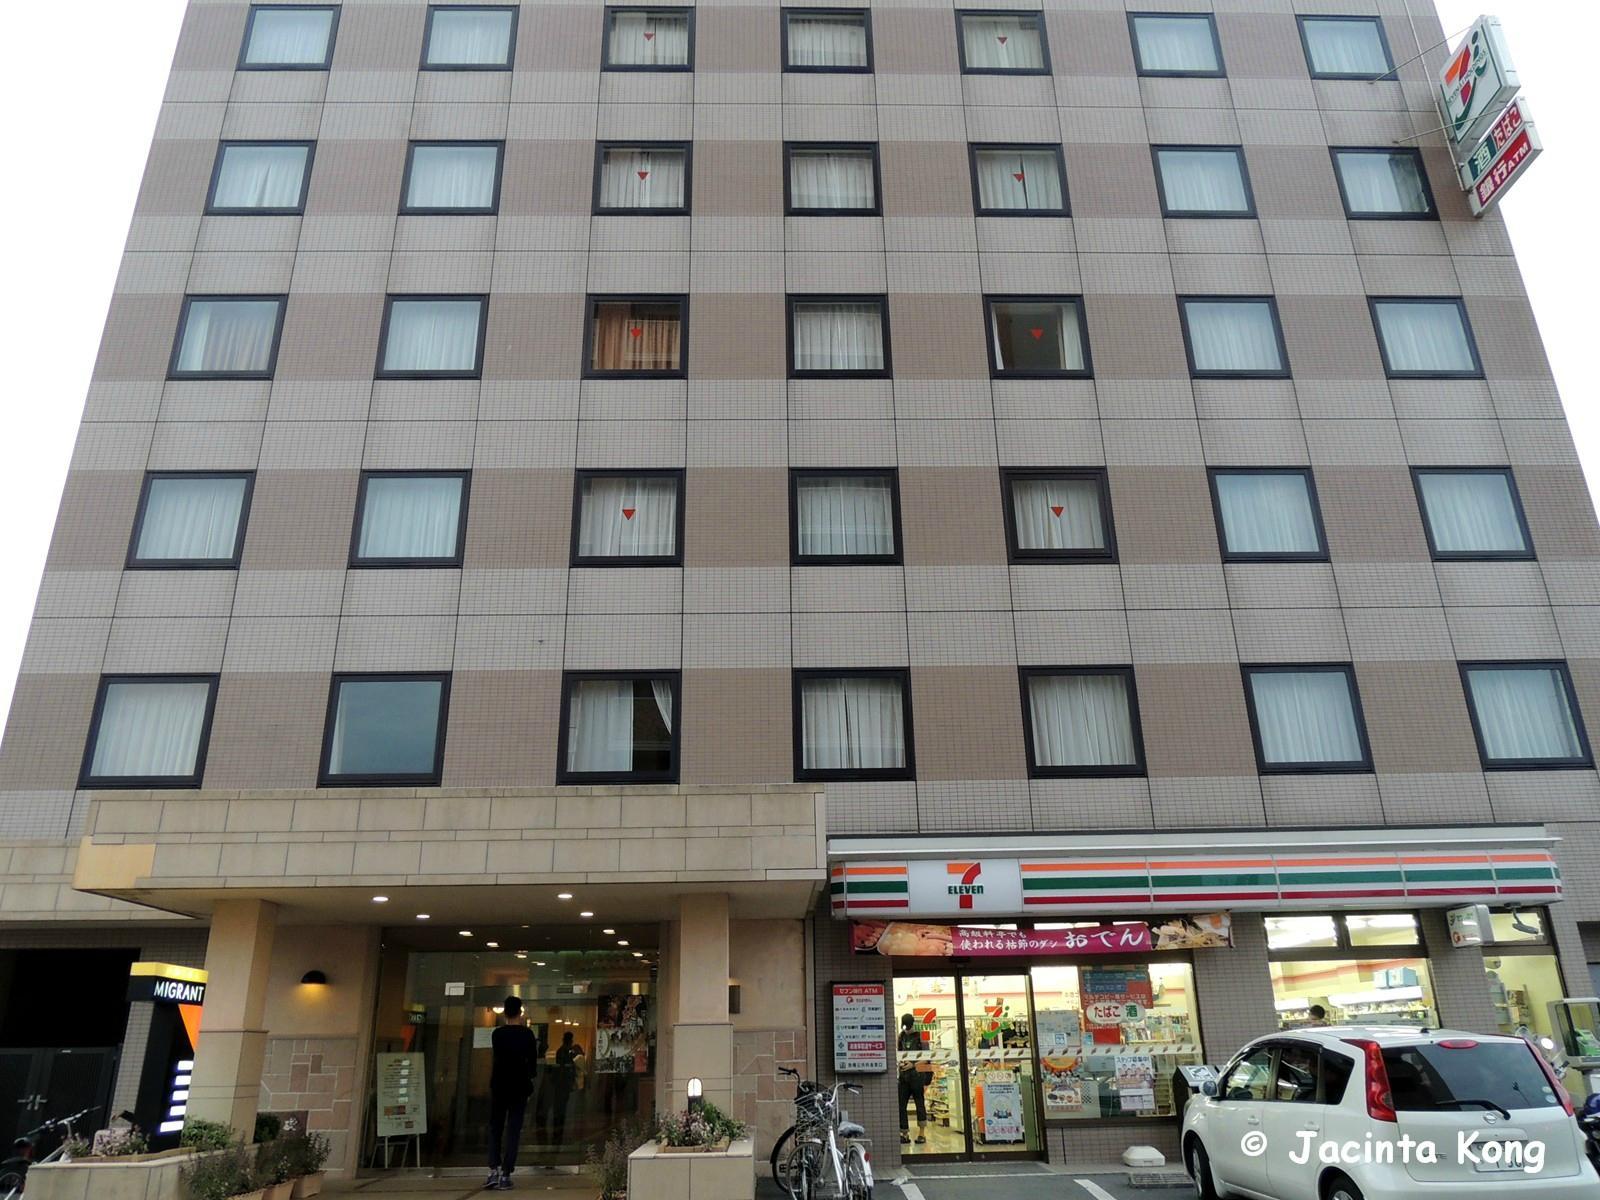 Hotel Migrant